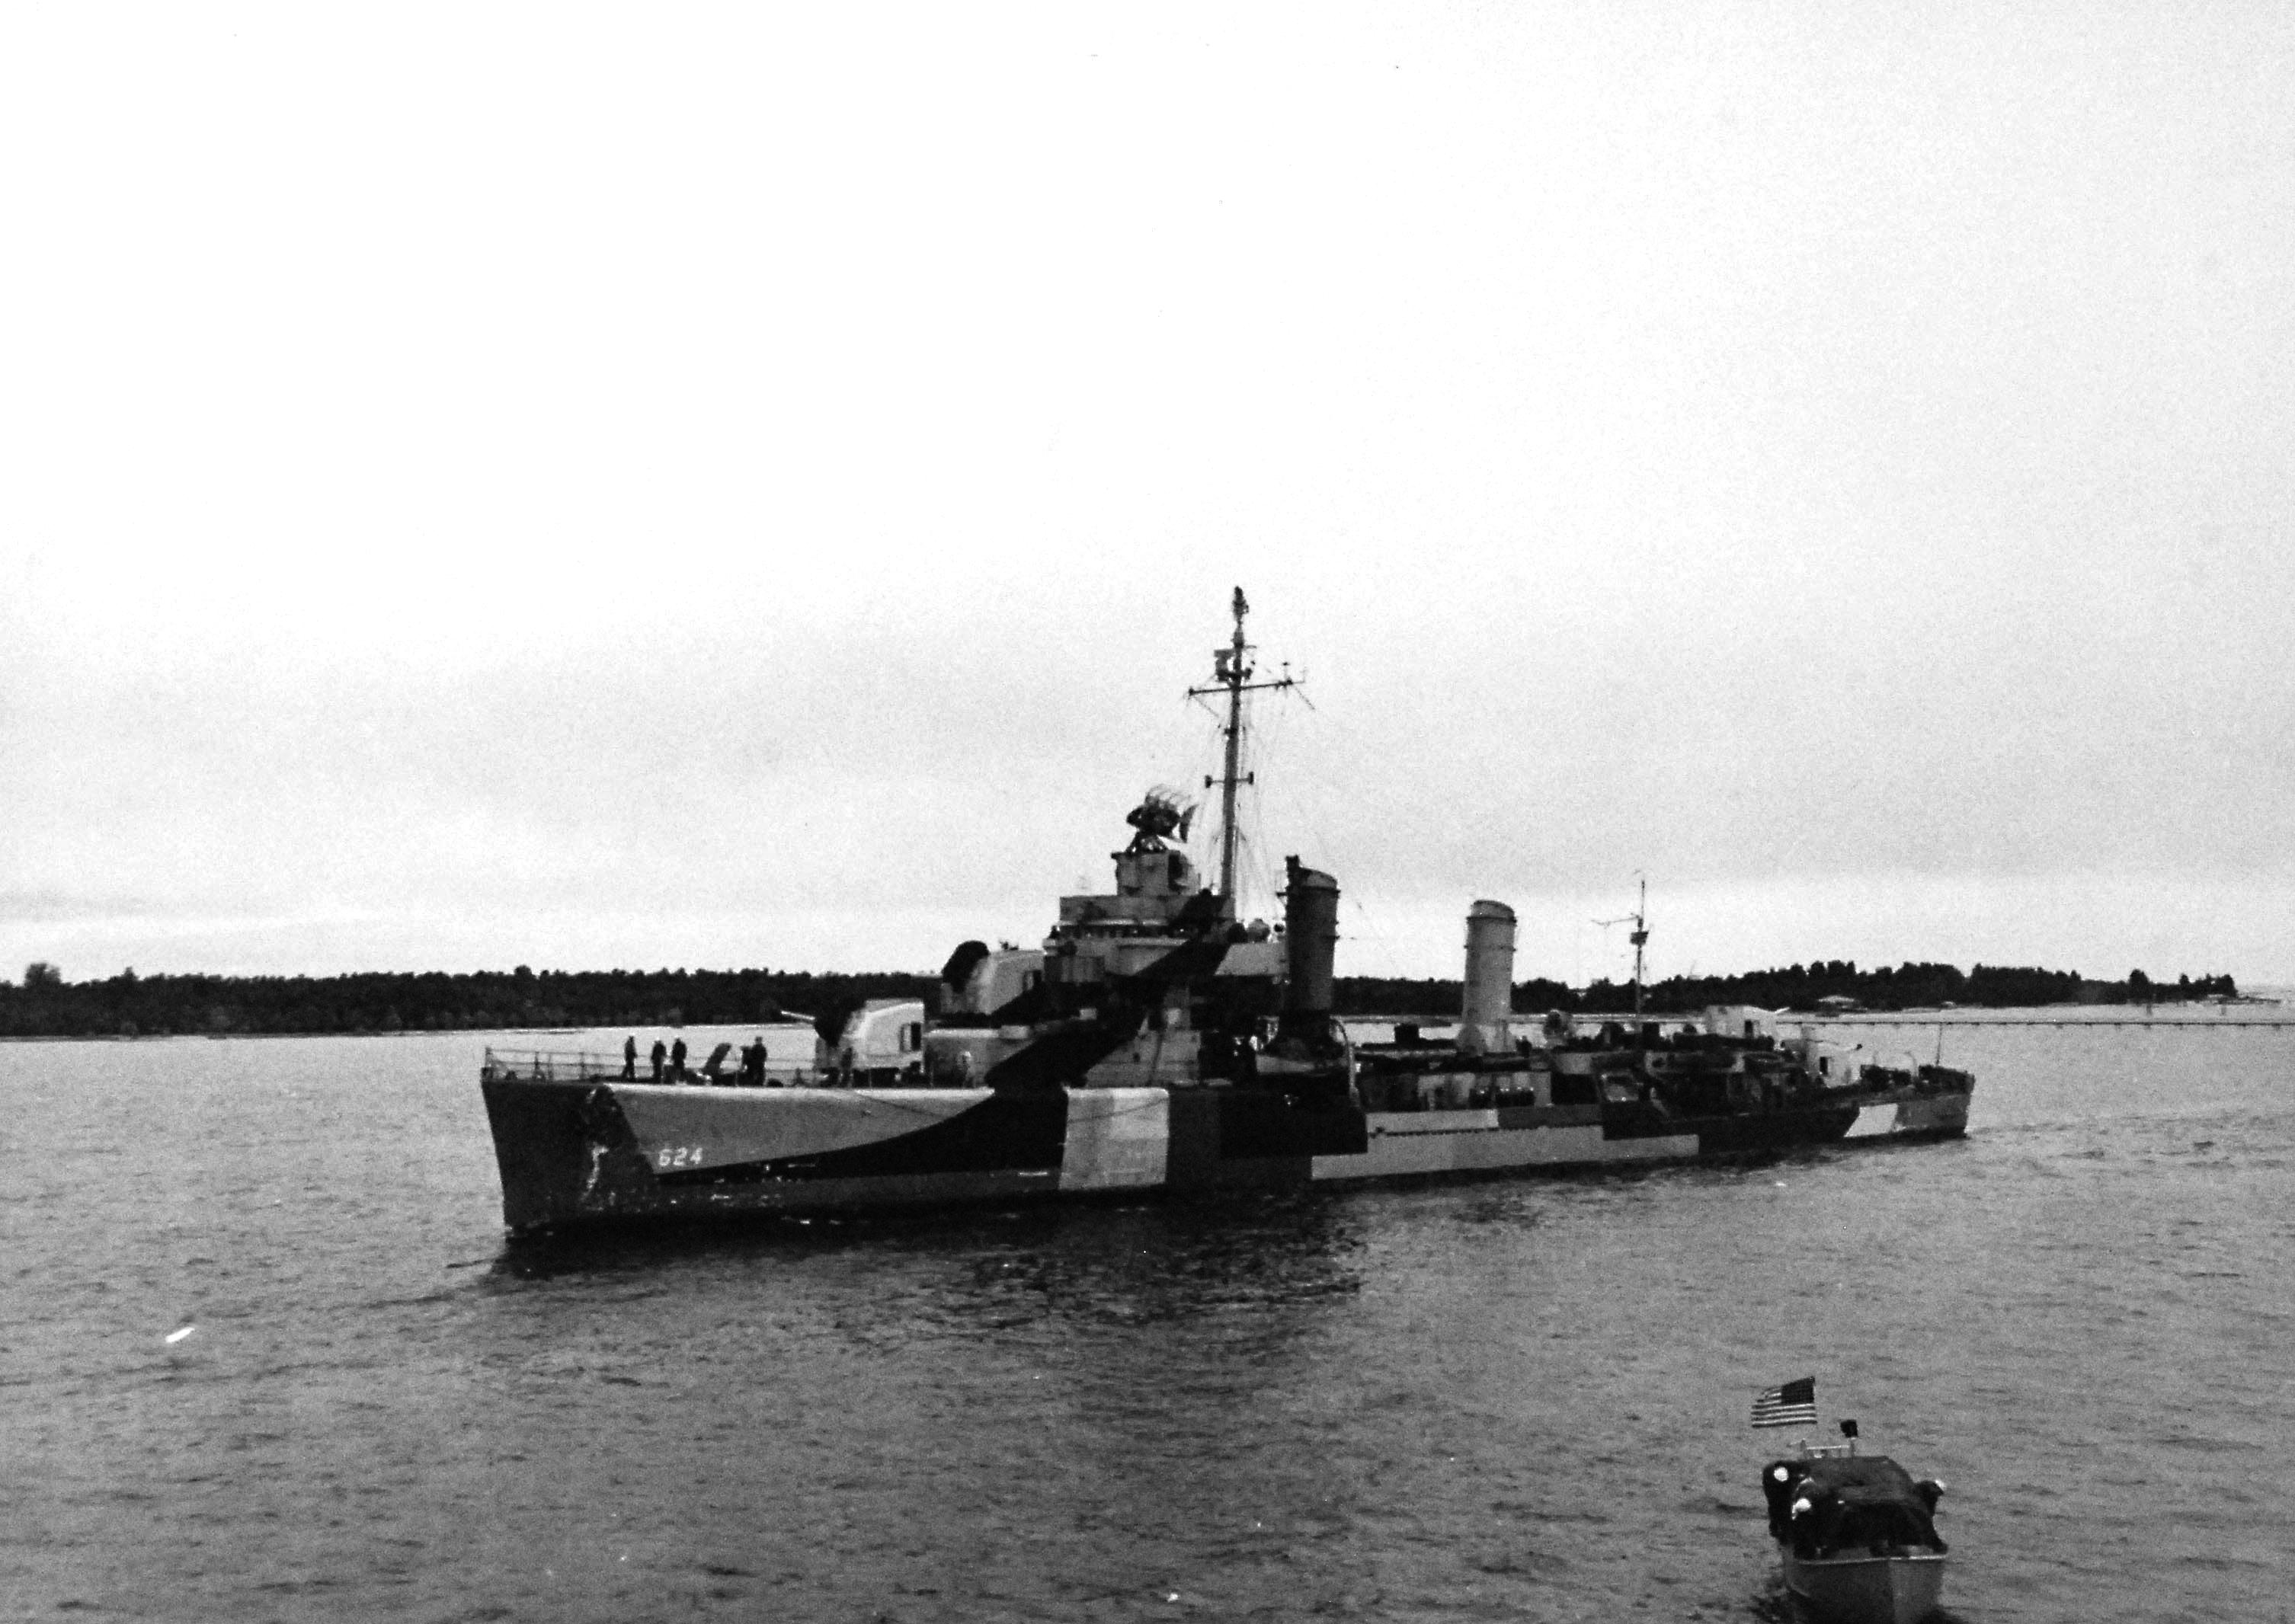 USS Baldwin (DD-624) in the Suez Canal, Egypt, on 9 February 1945.